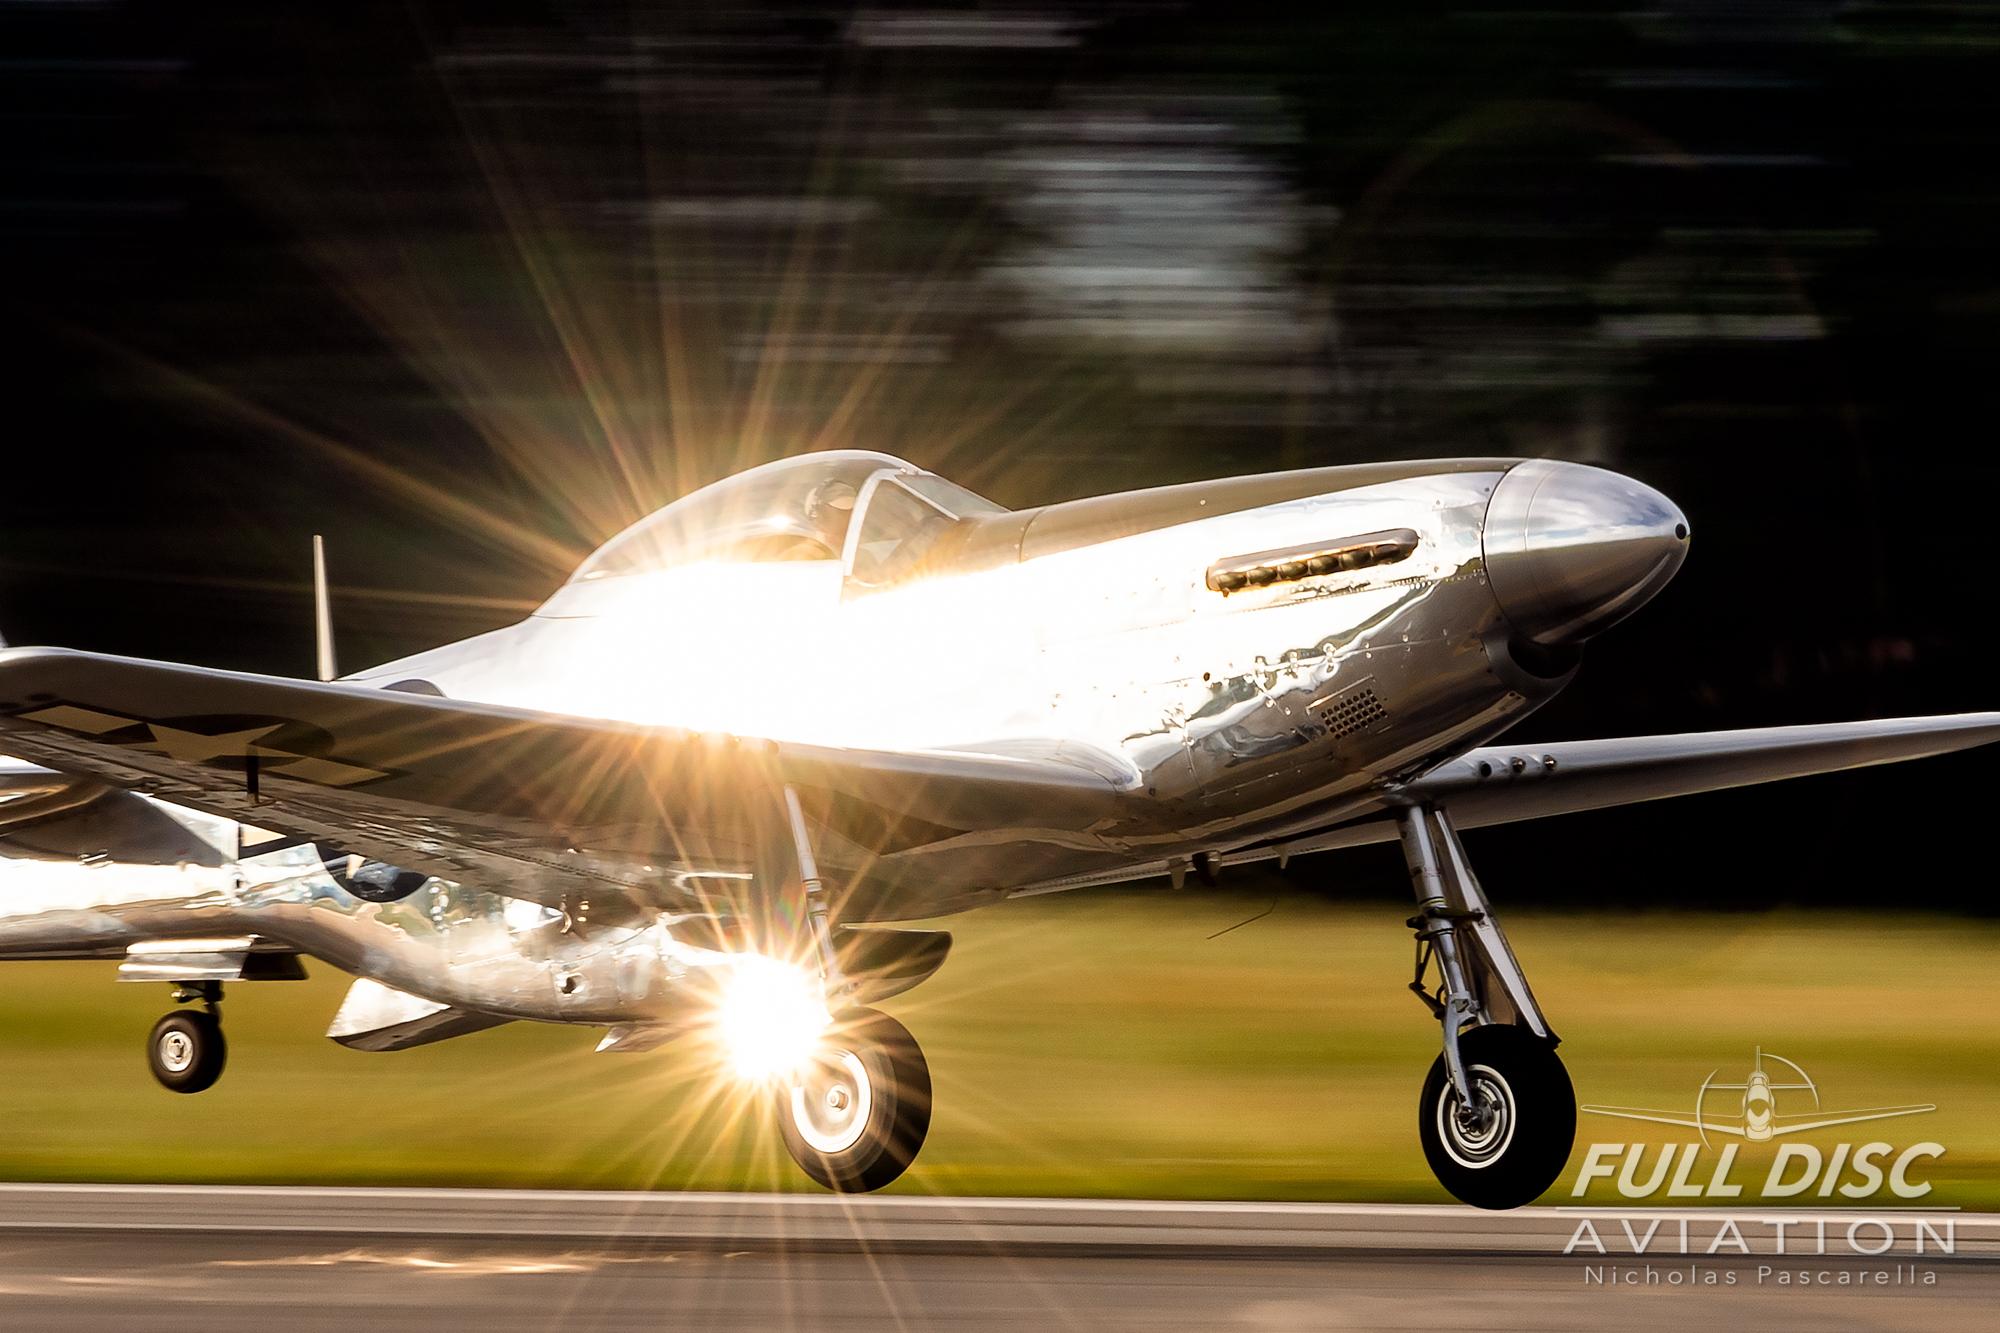 nickpascarella_nicholaspascarella_fulldiscaviation_aircraft_mustang_p51_takeoff.jpg